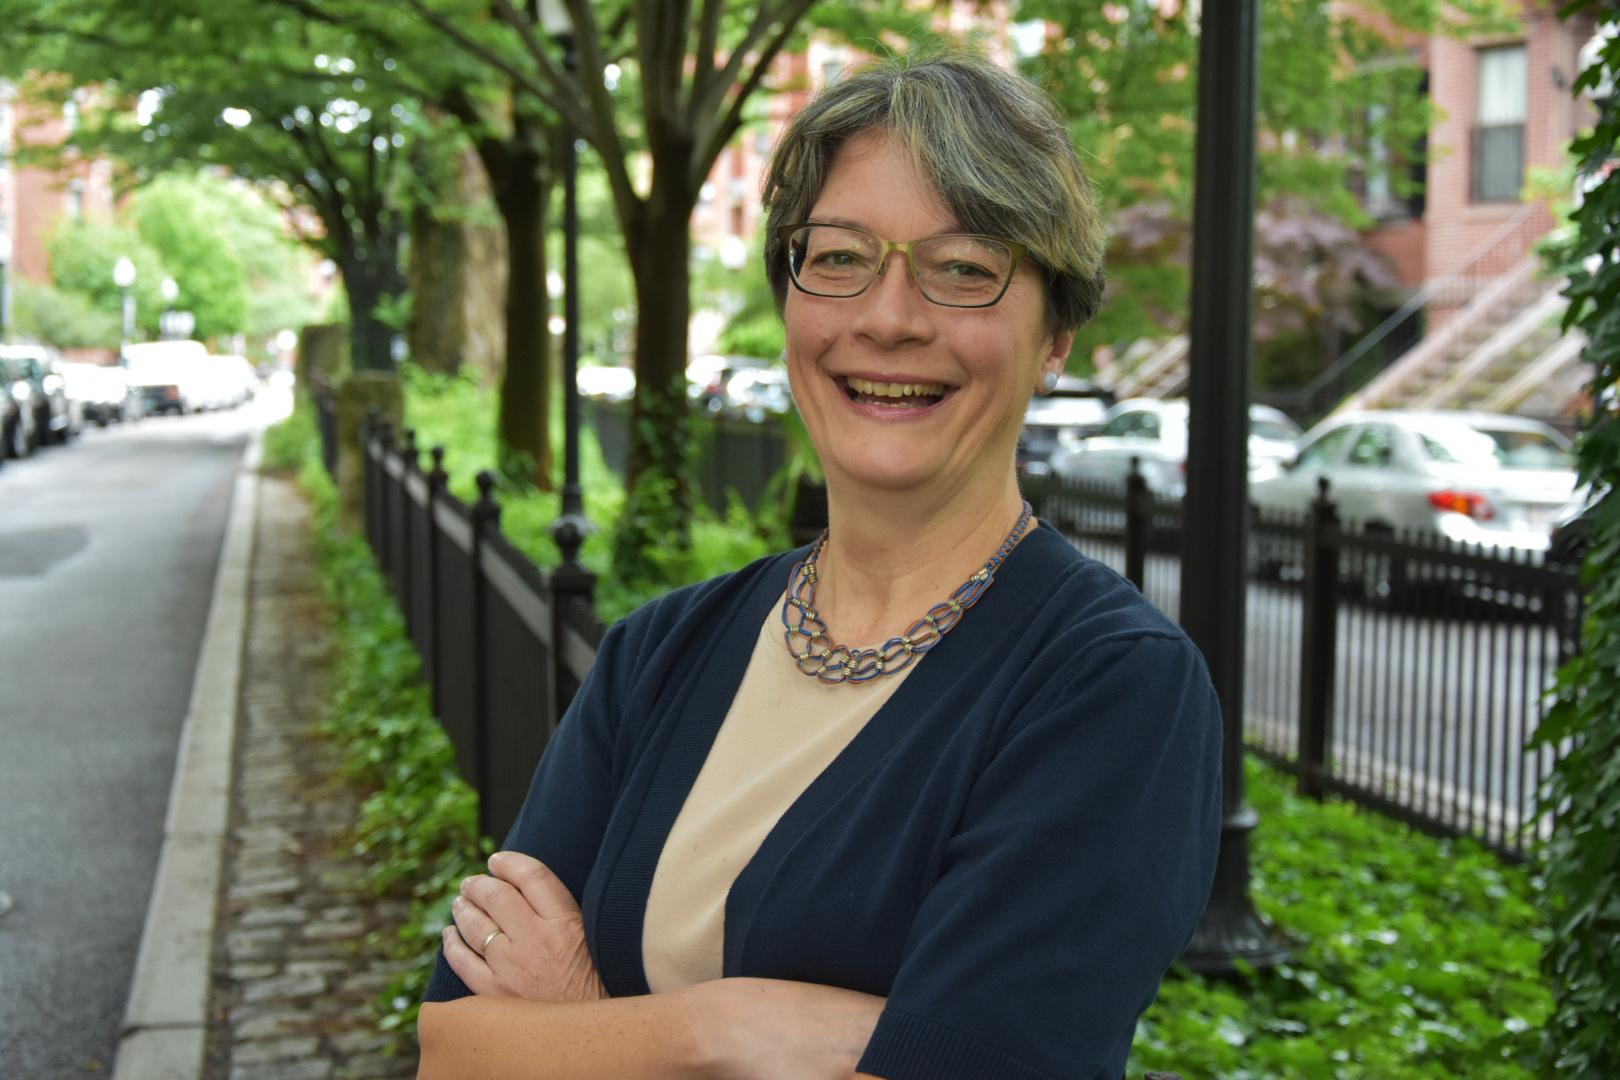 Teresa Neff PhD smiling